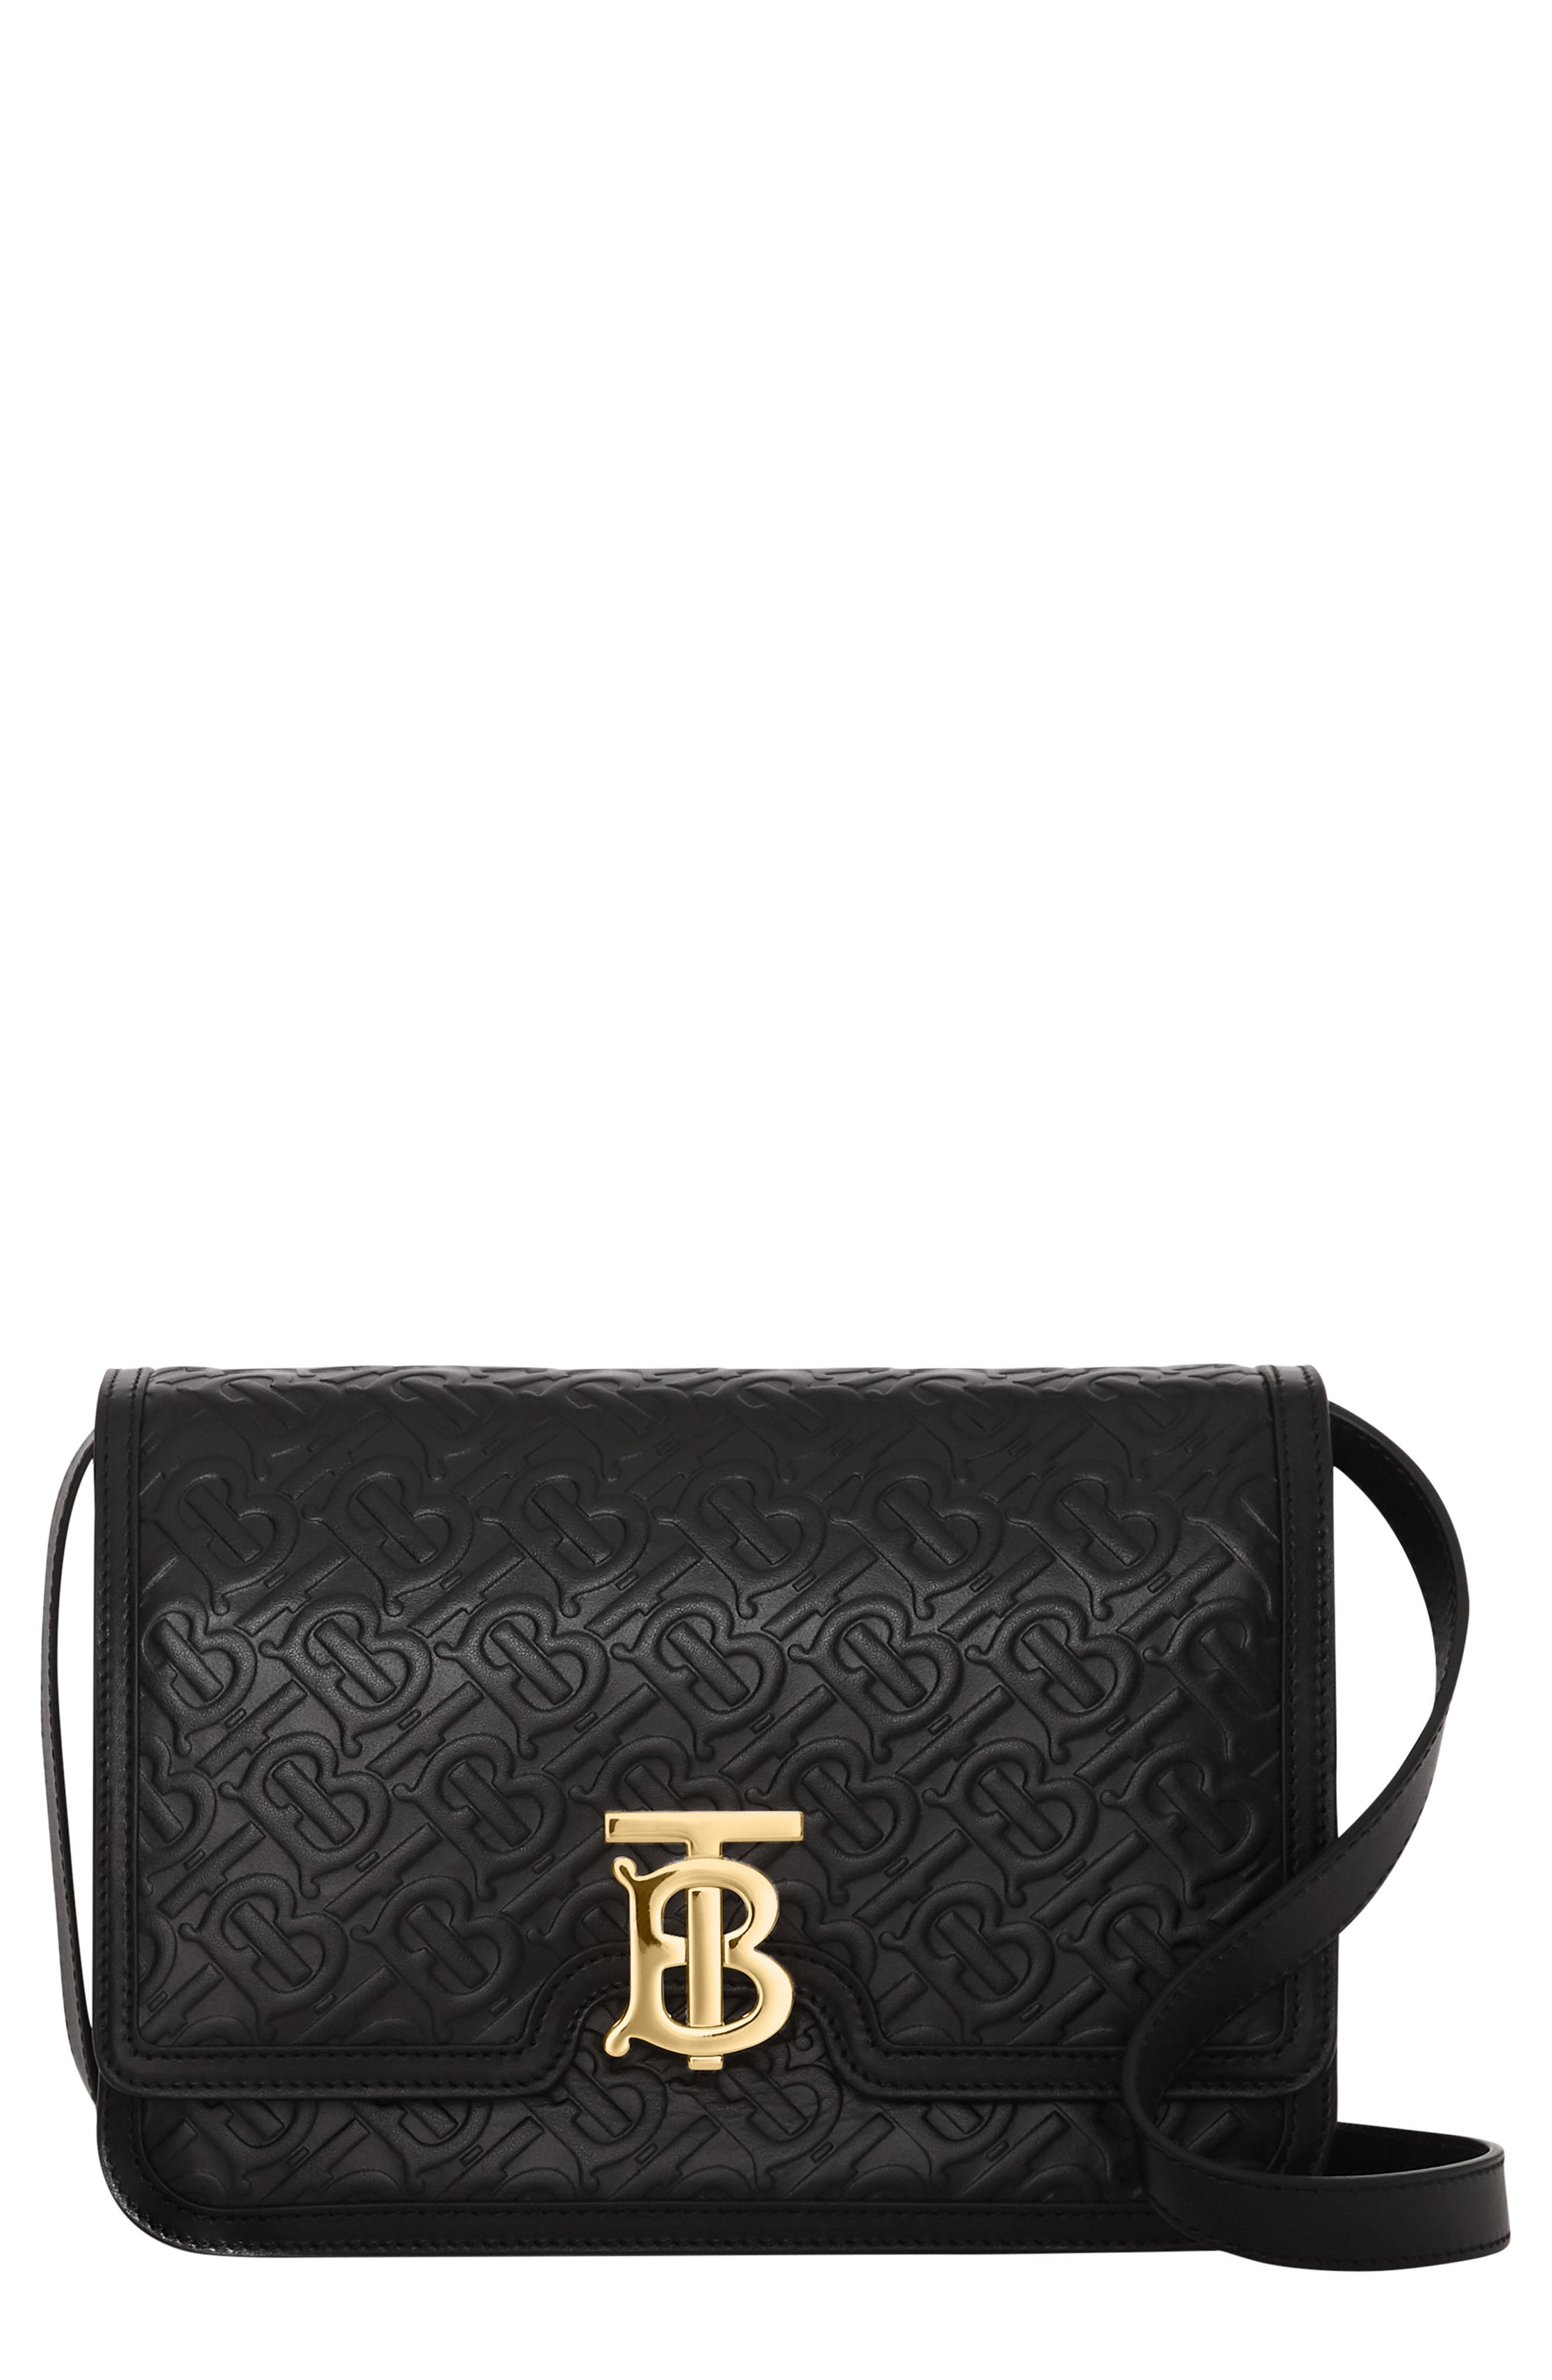 BURBERRY, Medium TB Monogram Leather Bag, Main thumbnail 1, color, BLACK